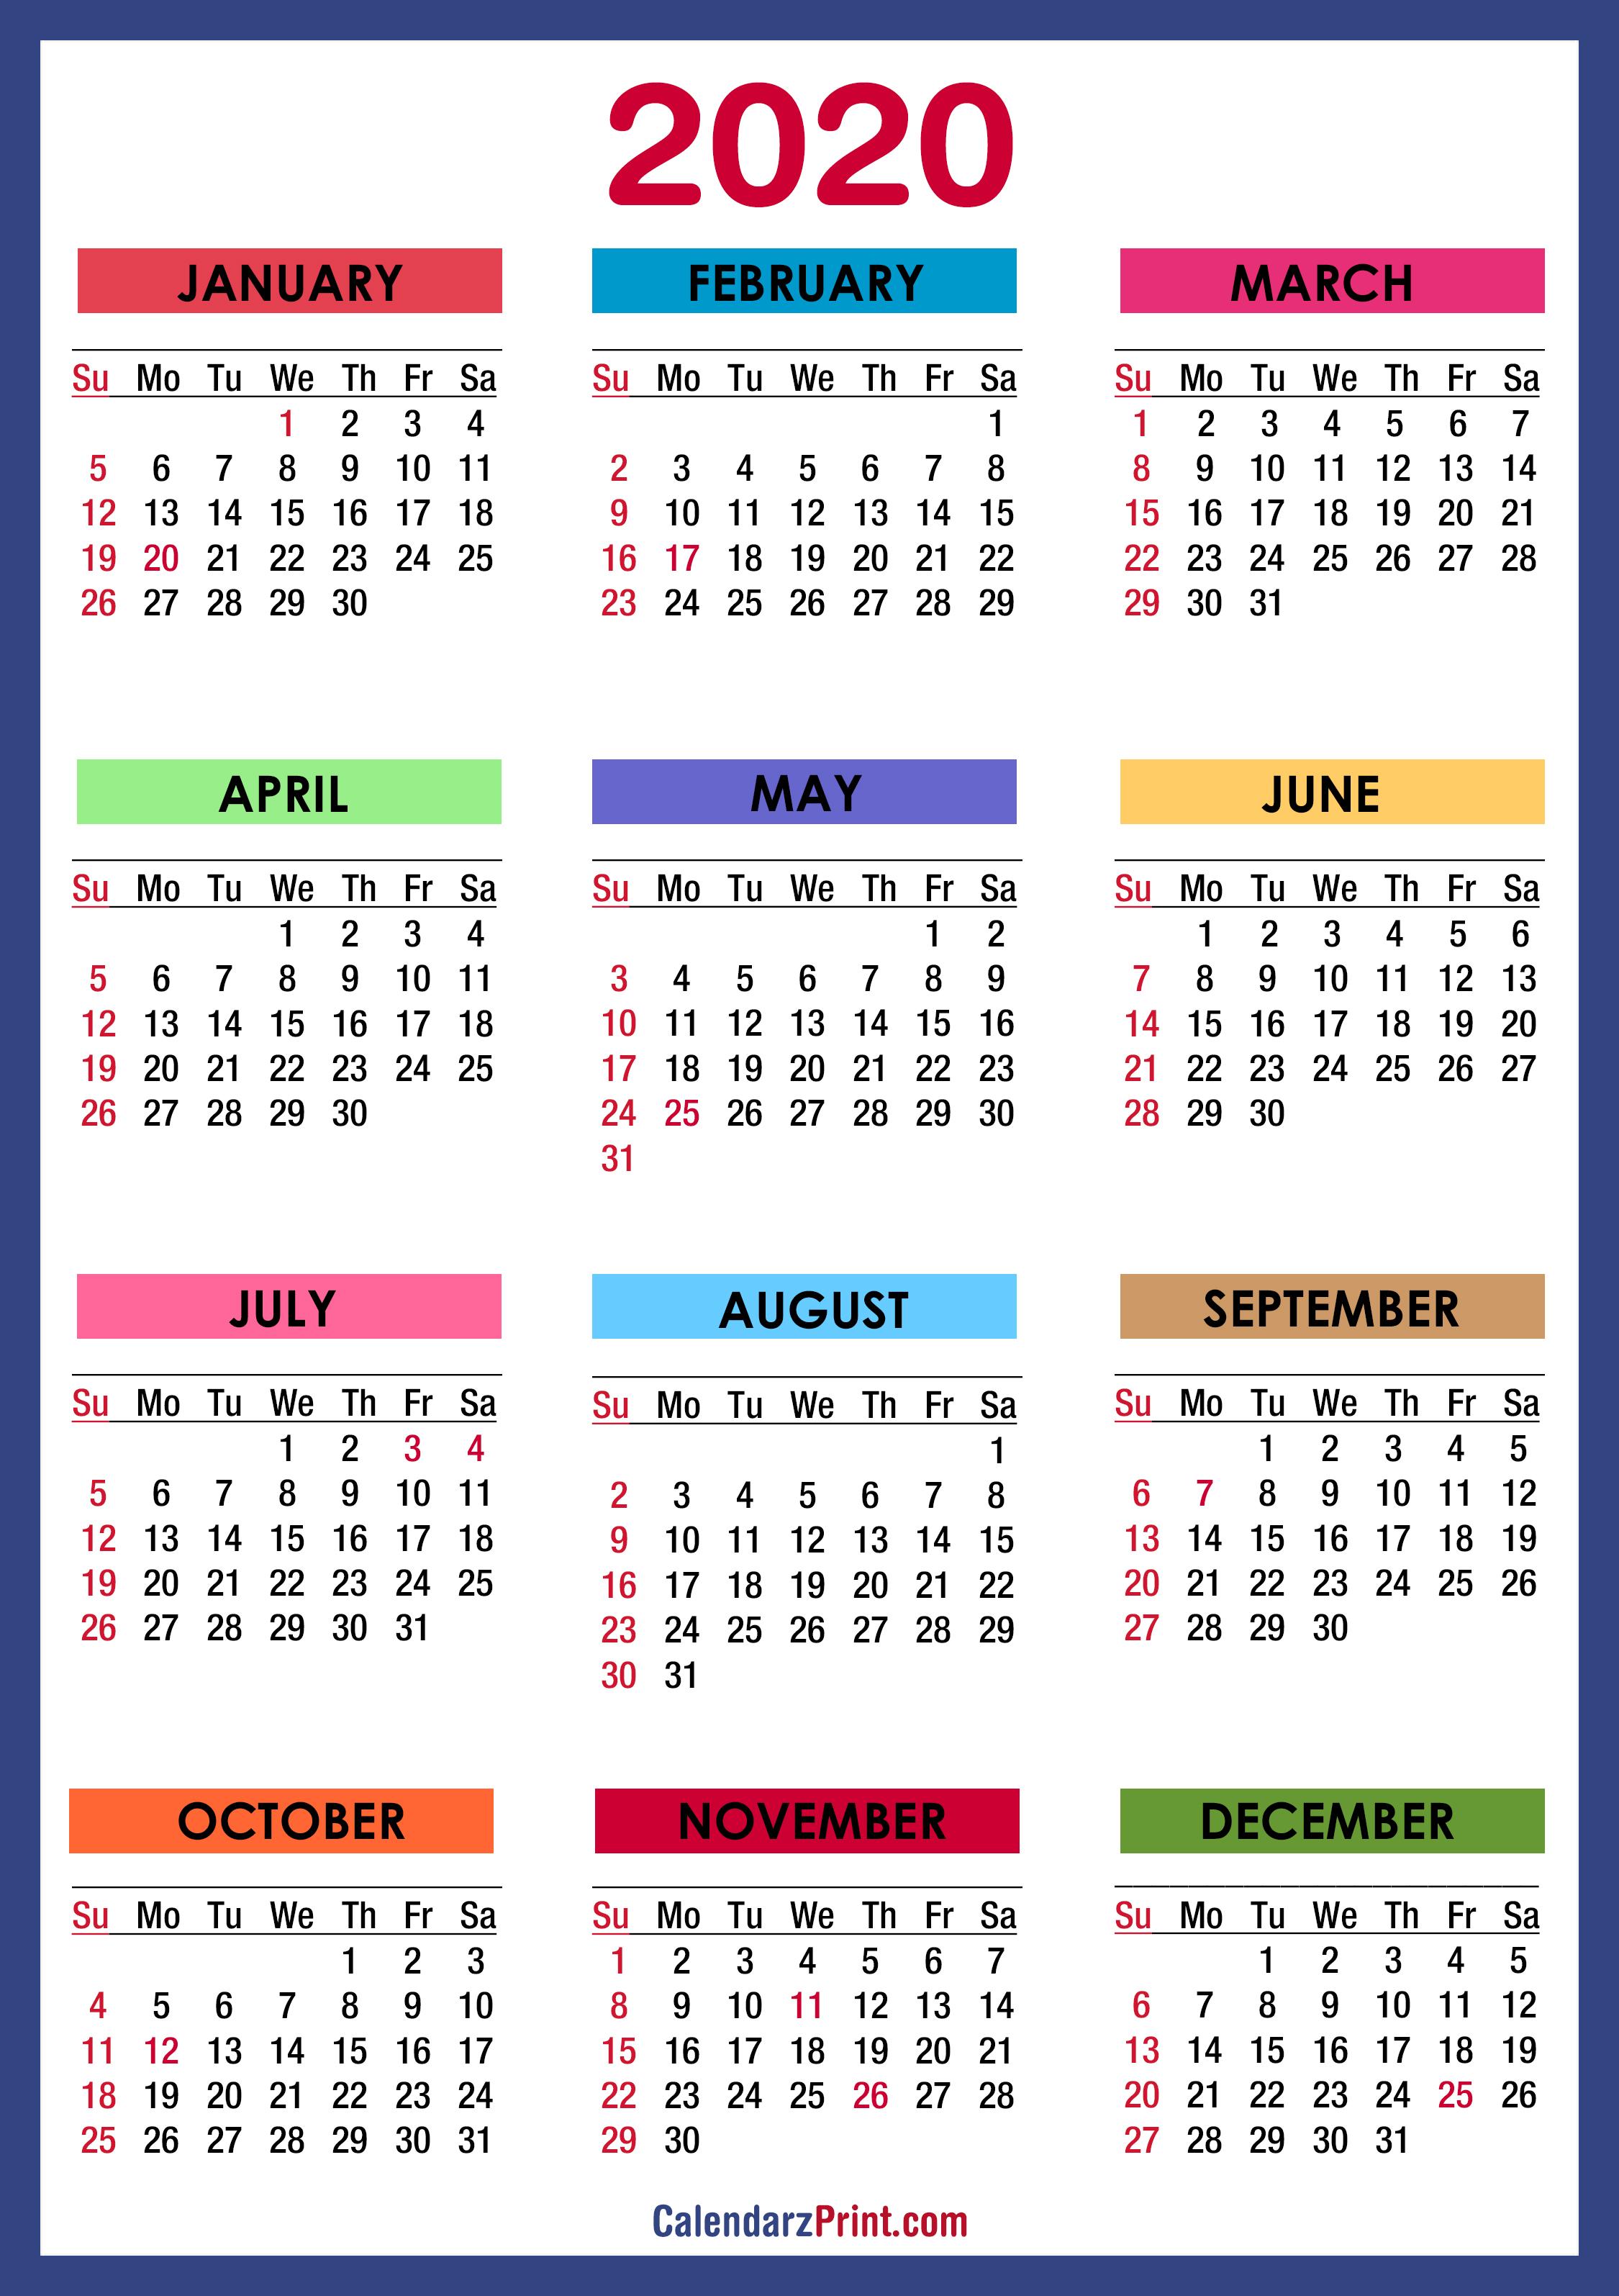 2020 Calendar With Holidays Printable Free Colorful Blue Green Sunday Start Calendarzprint Free Calendars Printable Calendars